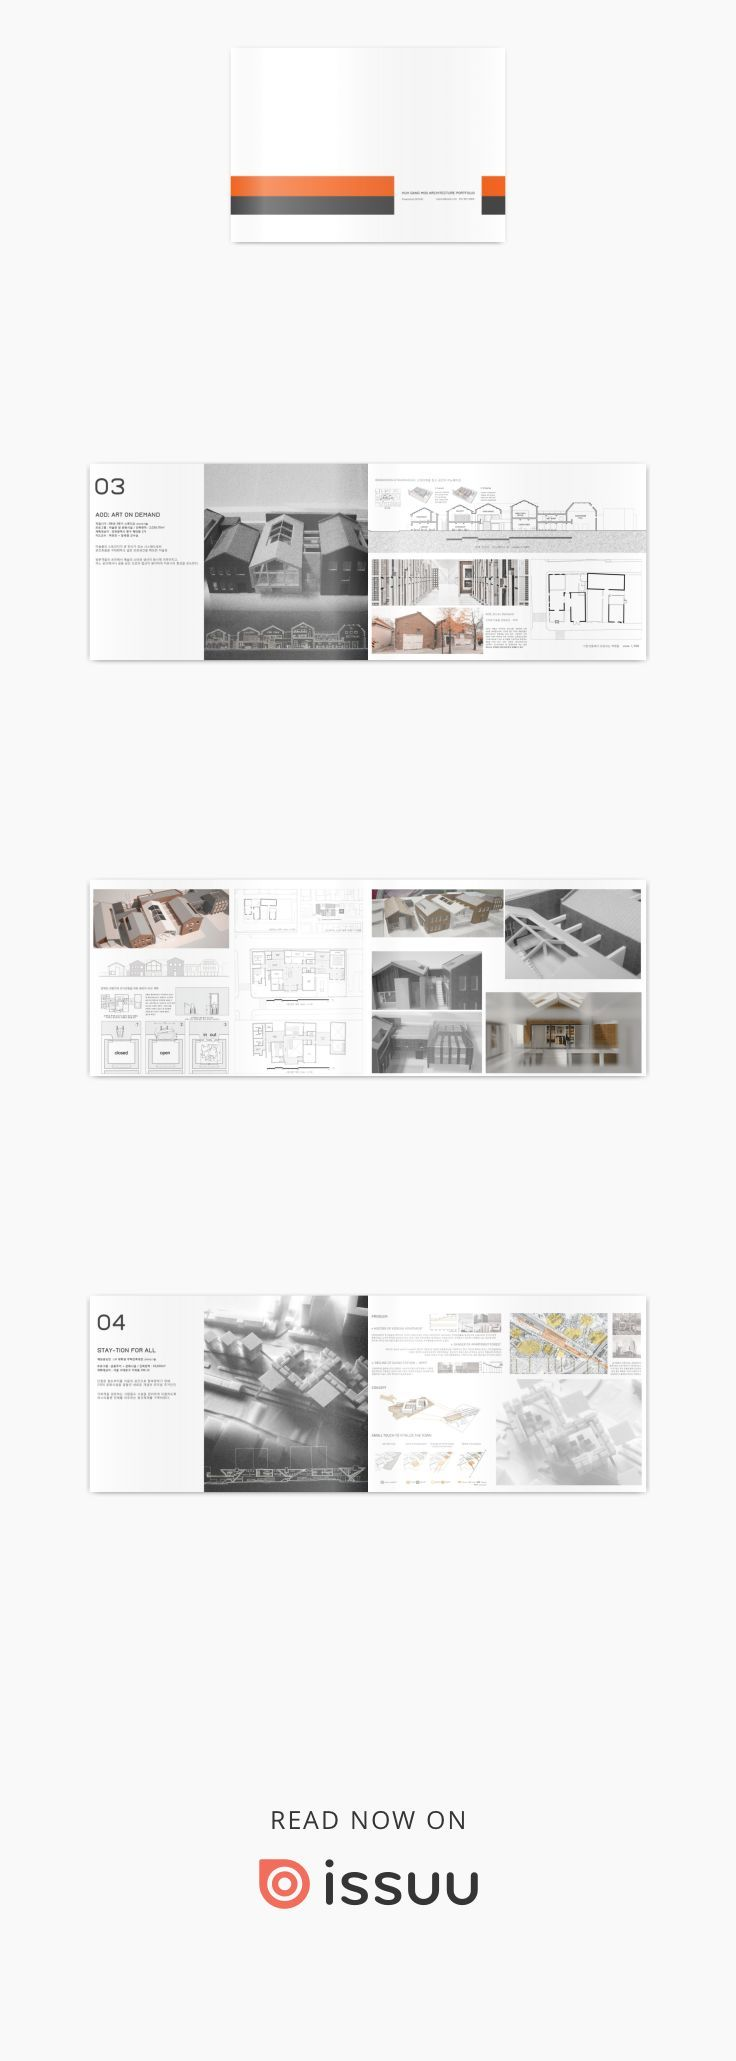 Interior Designing Portfolio Ppt - valoblogi com